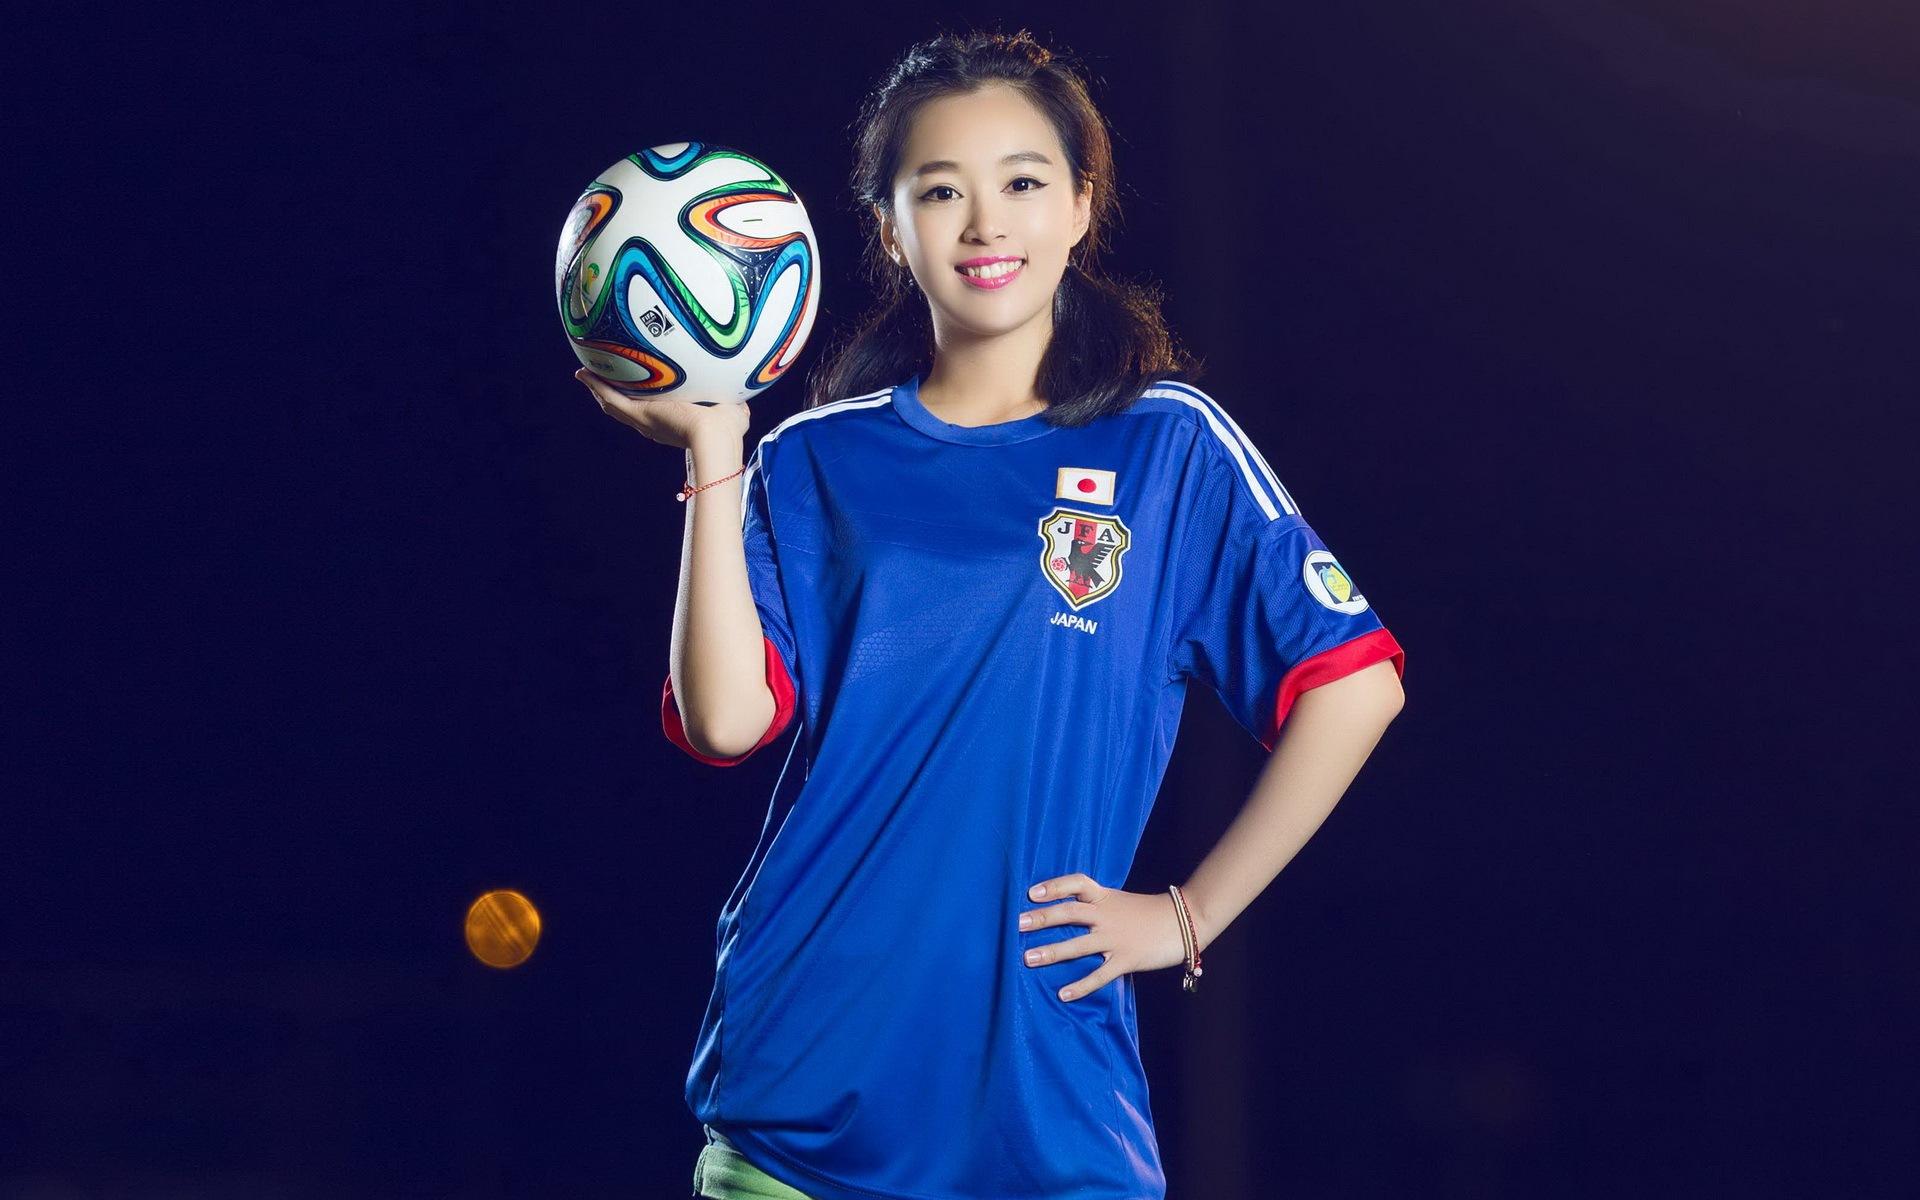 Soccer Girls Wallpaper Free: Football Girls Wallpaper